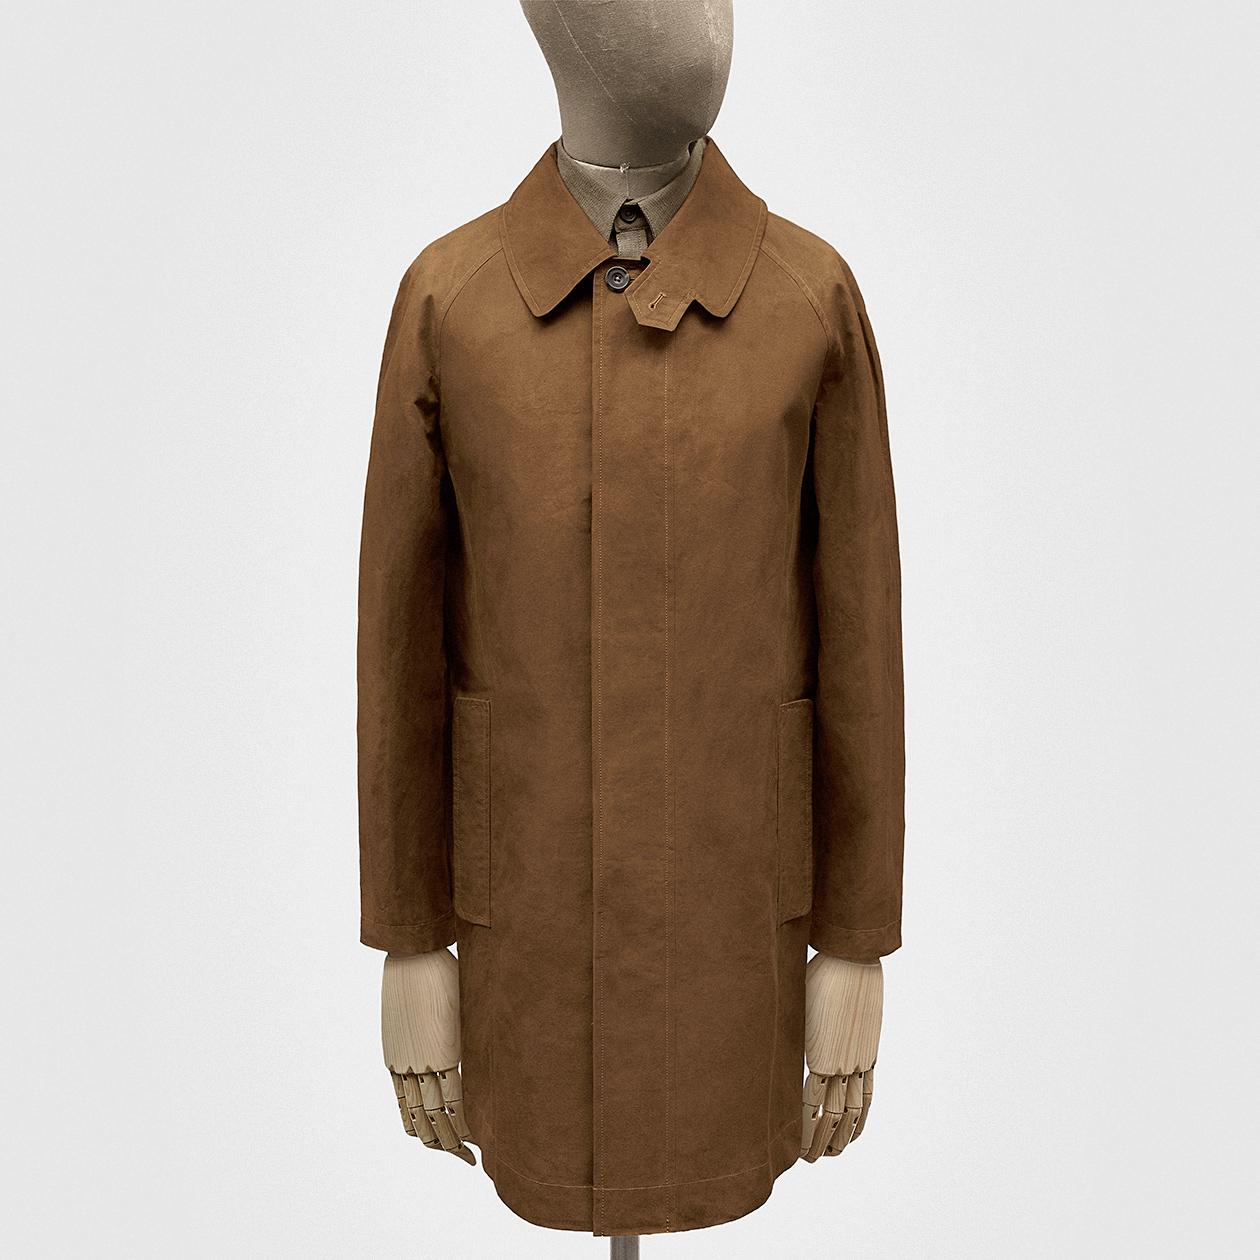 balmacaan-no-wax-cotton-copper-1.jpg